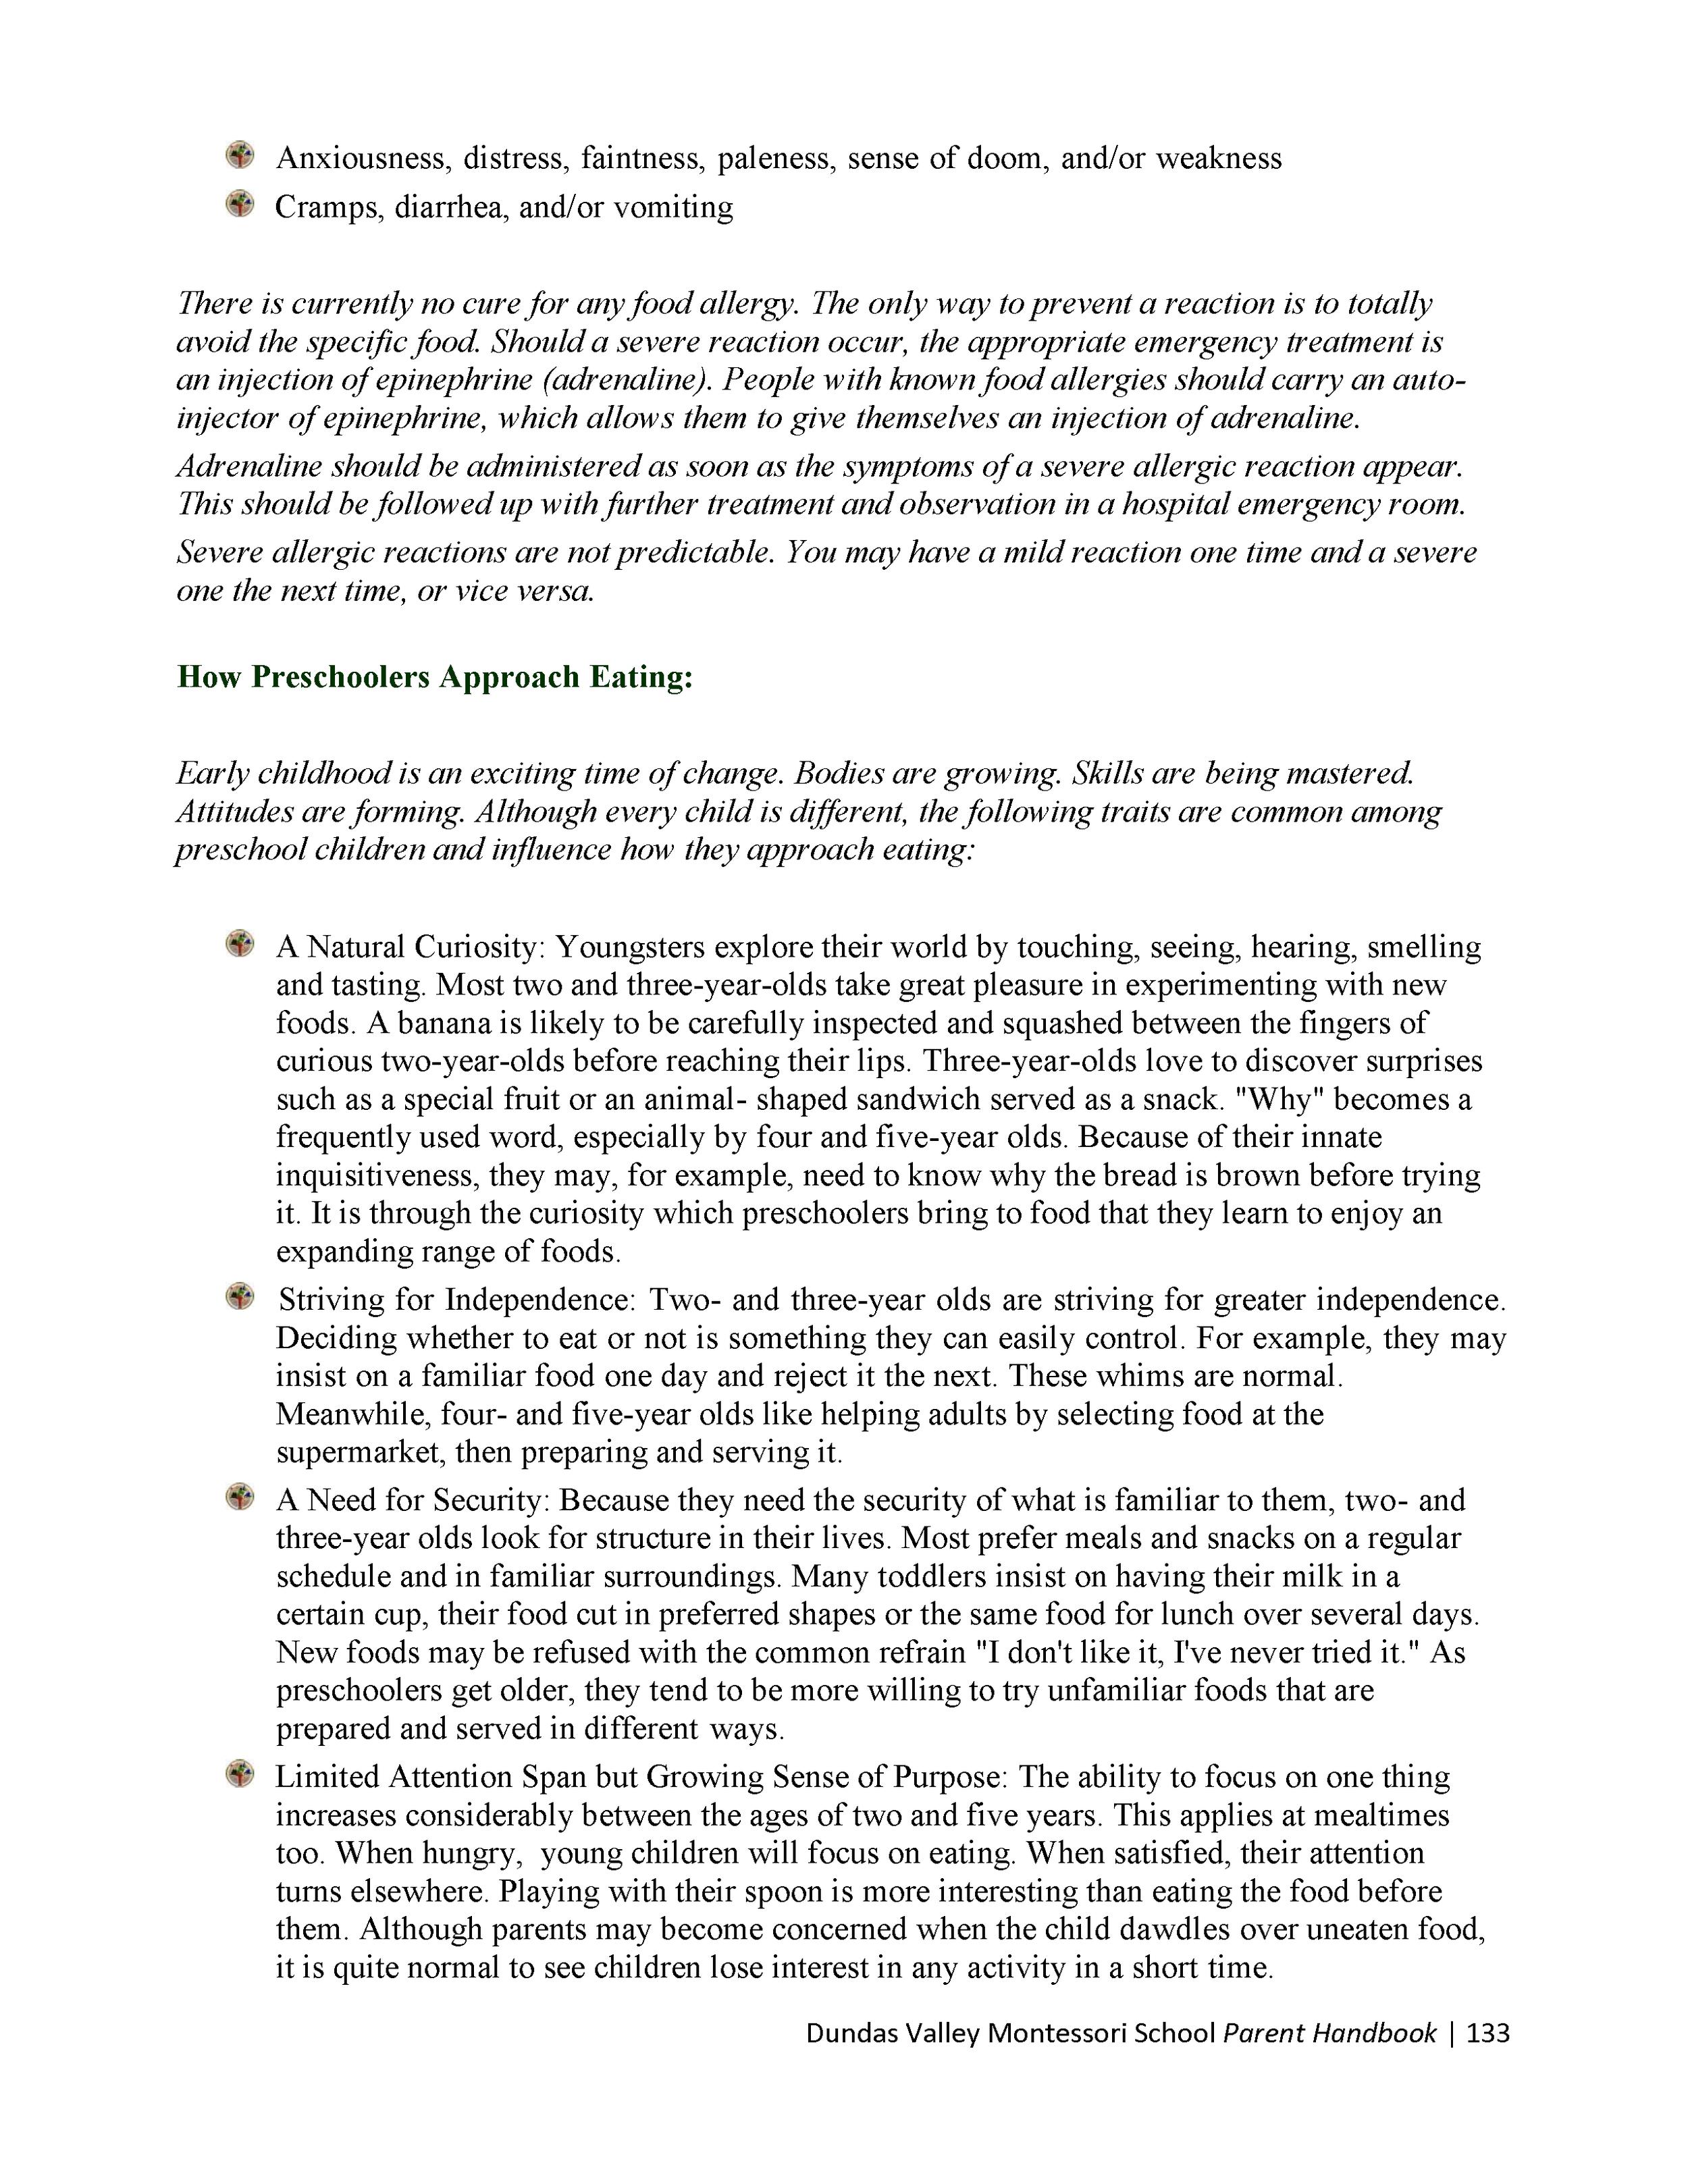 DVMS-Parent-Handbook-19-20_Page_135.png